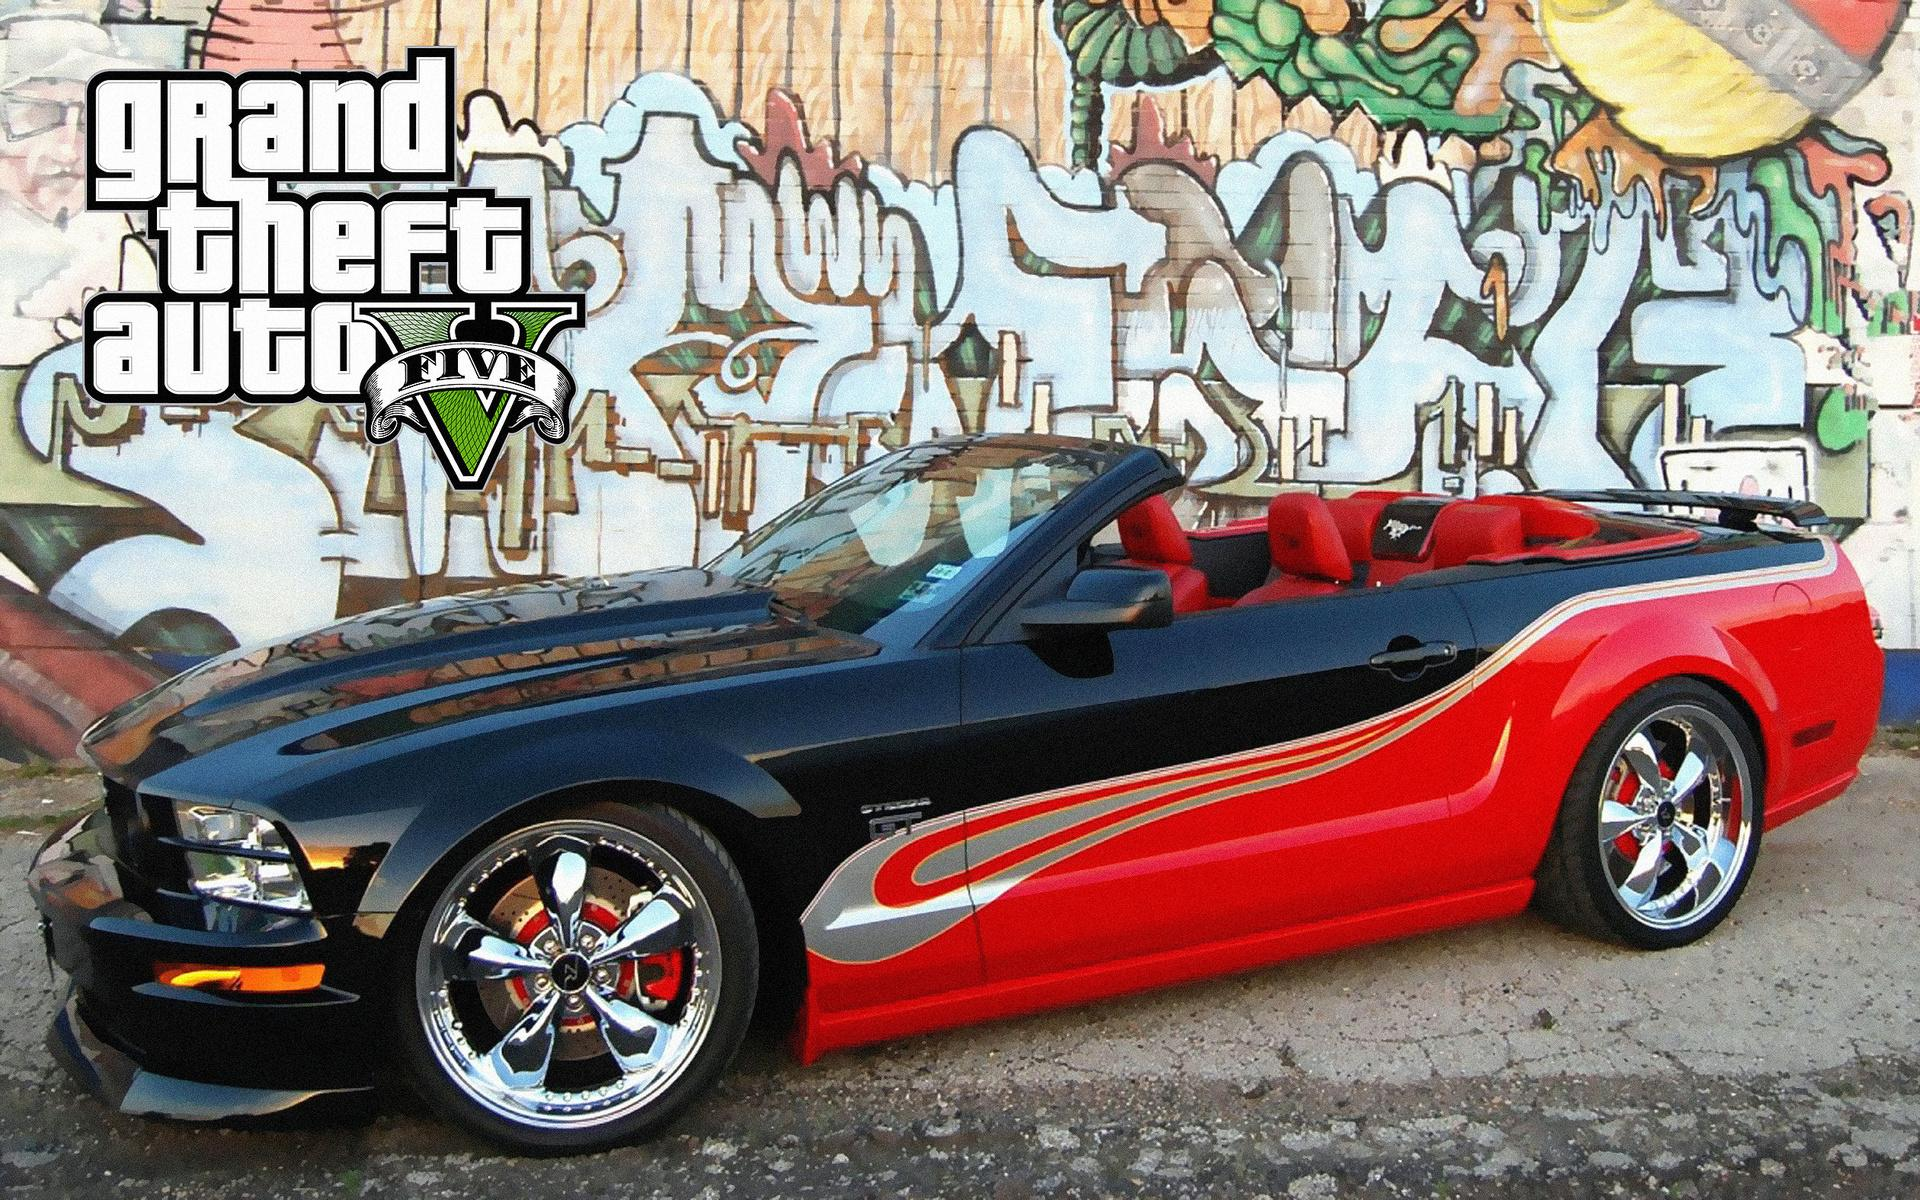 Gta 5 cars wallpaper wallpapersafari for Gta v bedroom wallpaper